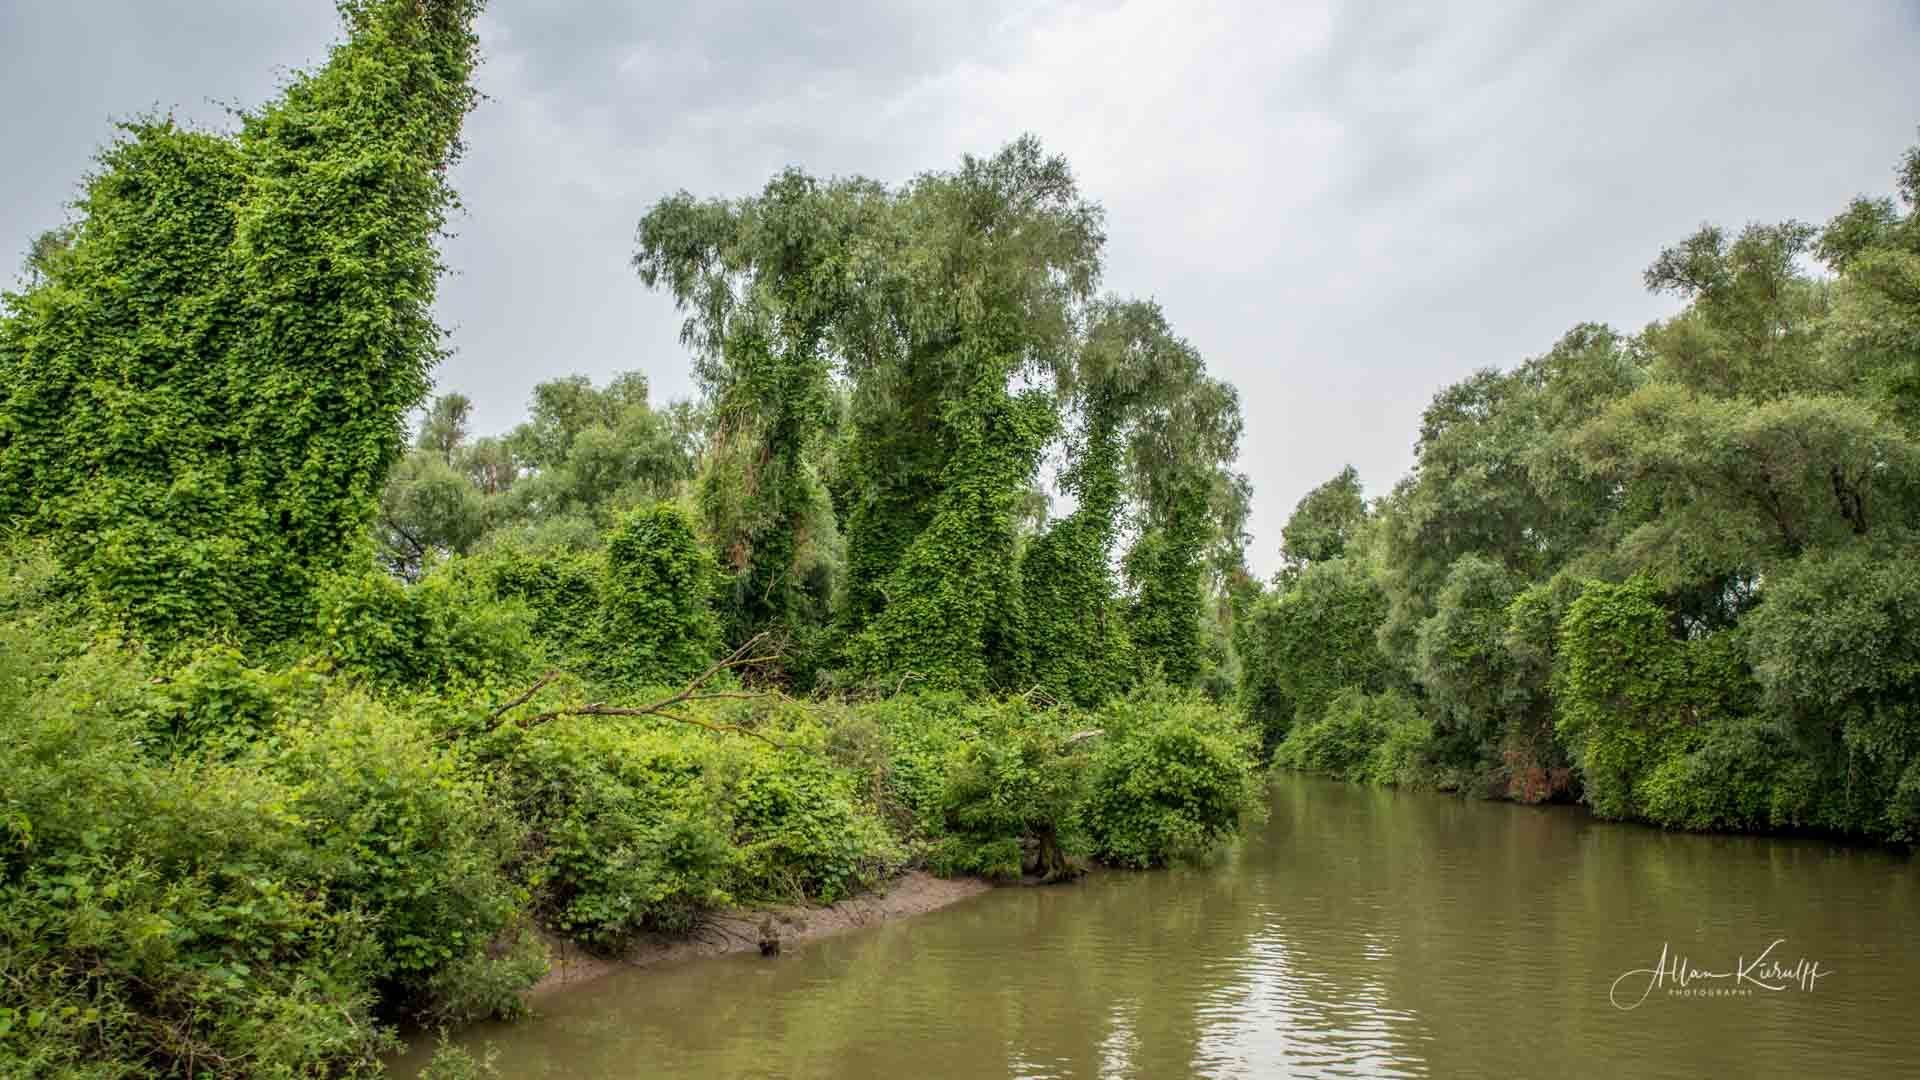 Donau Deltaet 49